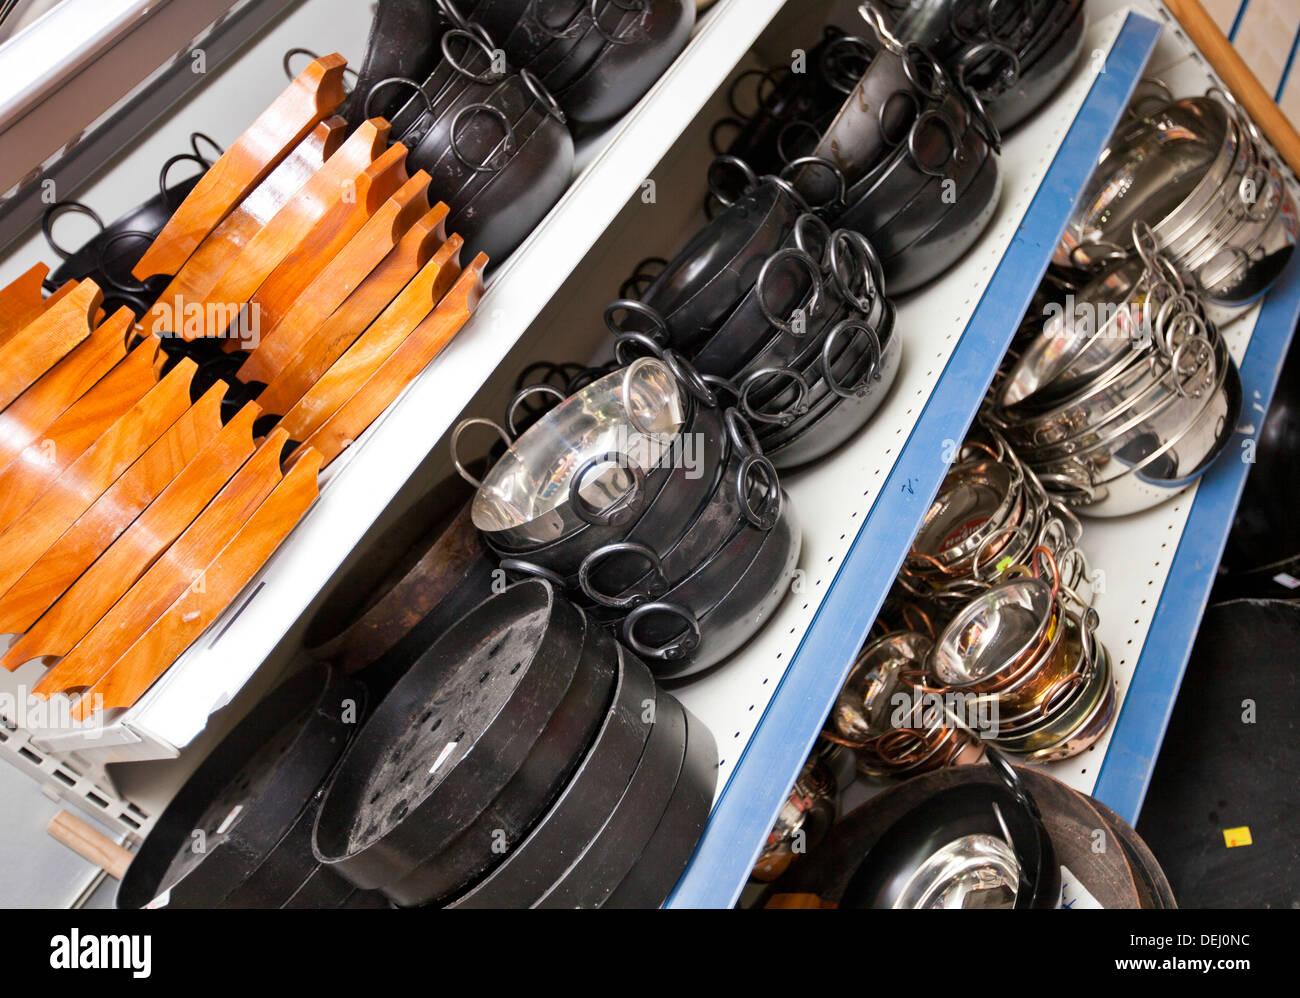 Kitchen utensils on display store - Stock Image